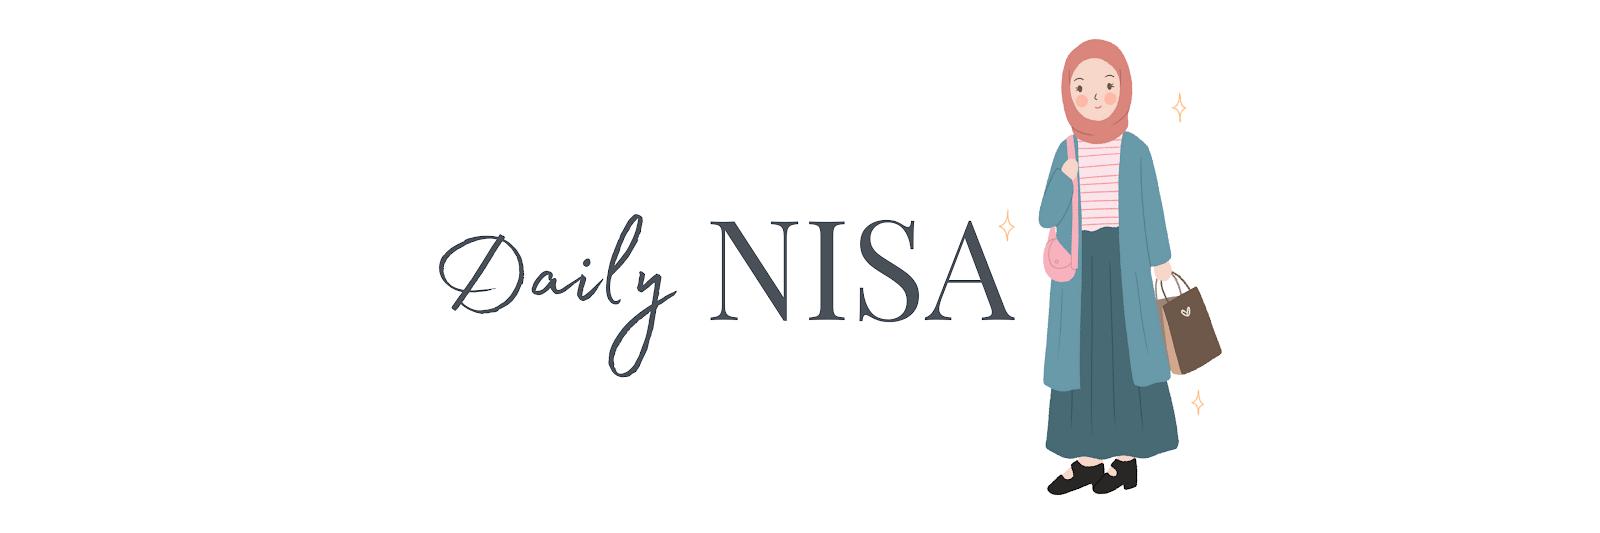 Daily Nisa